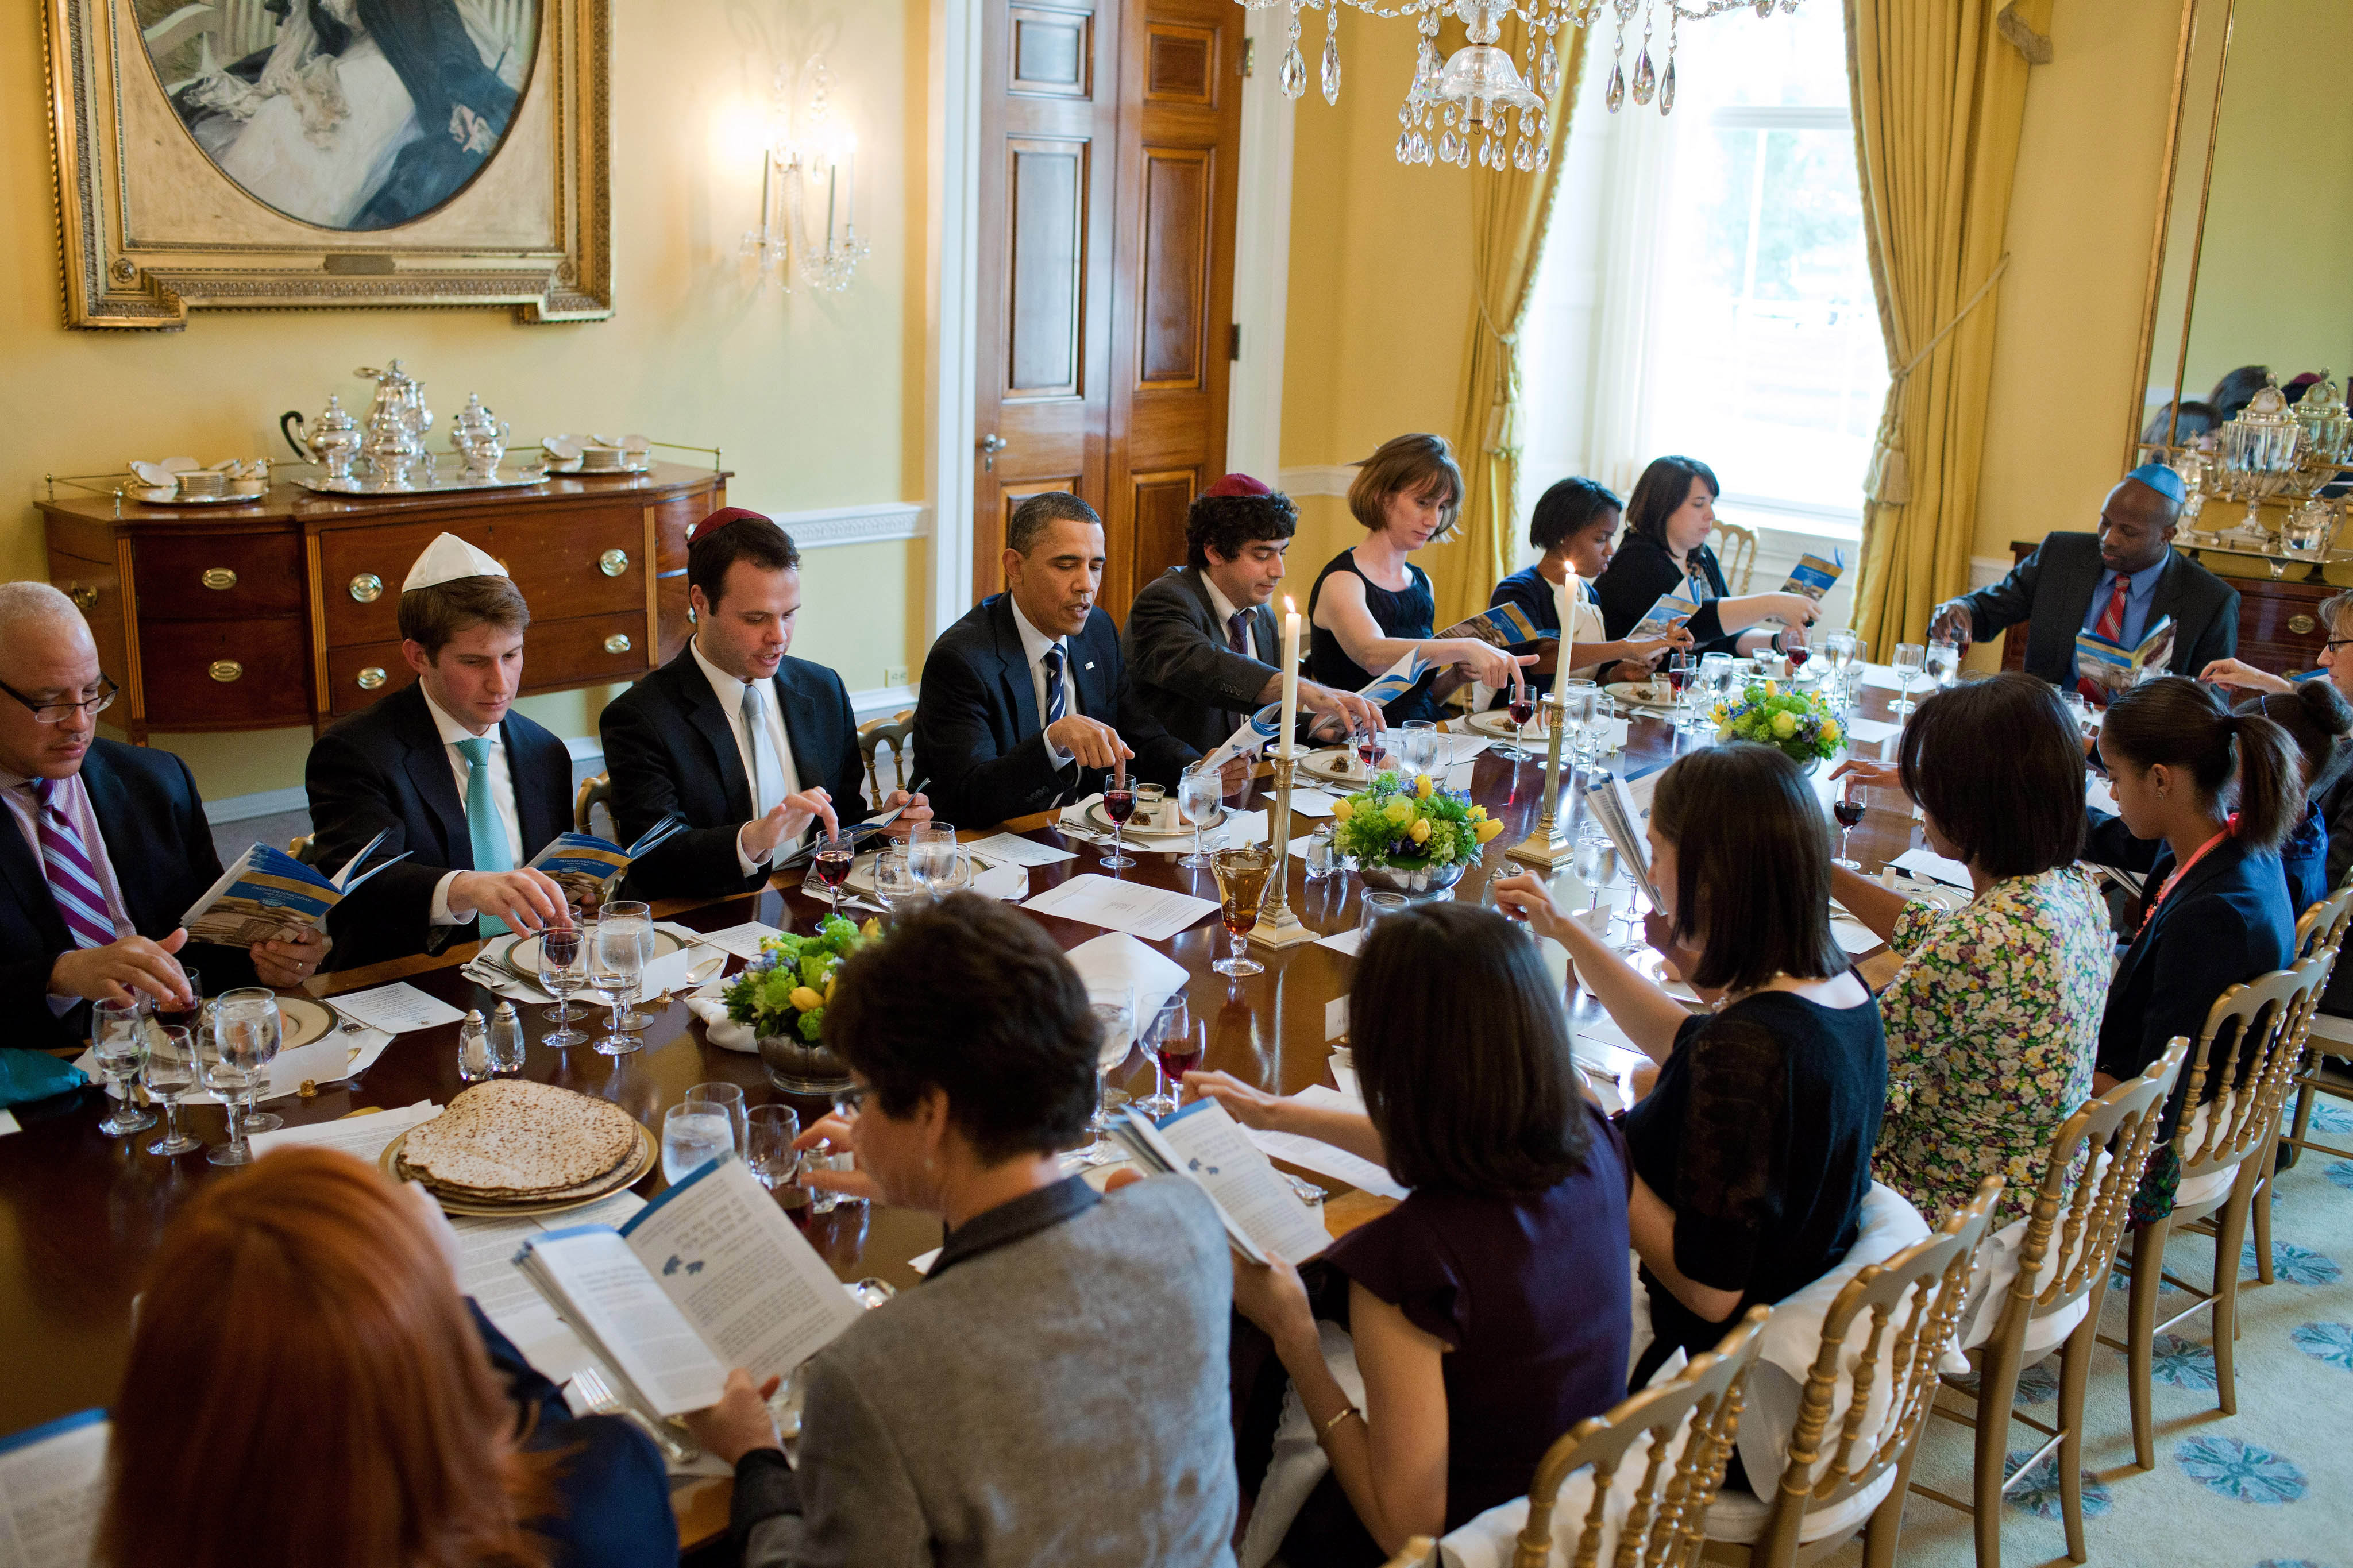 File Passover Seder Dinner At The White House